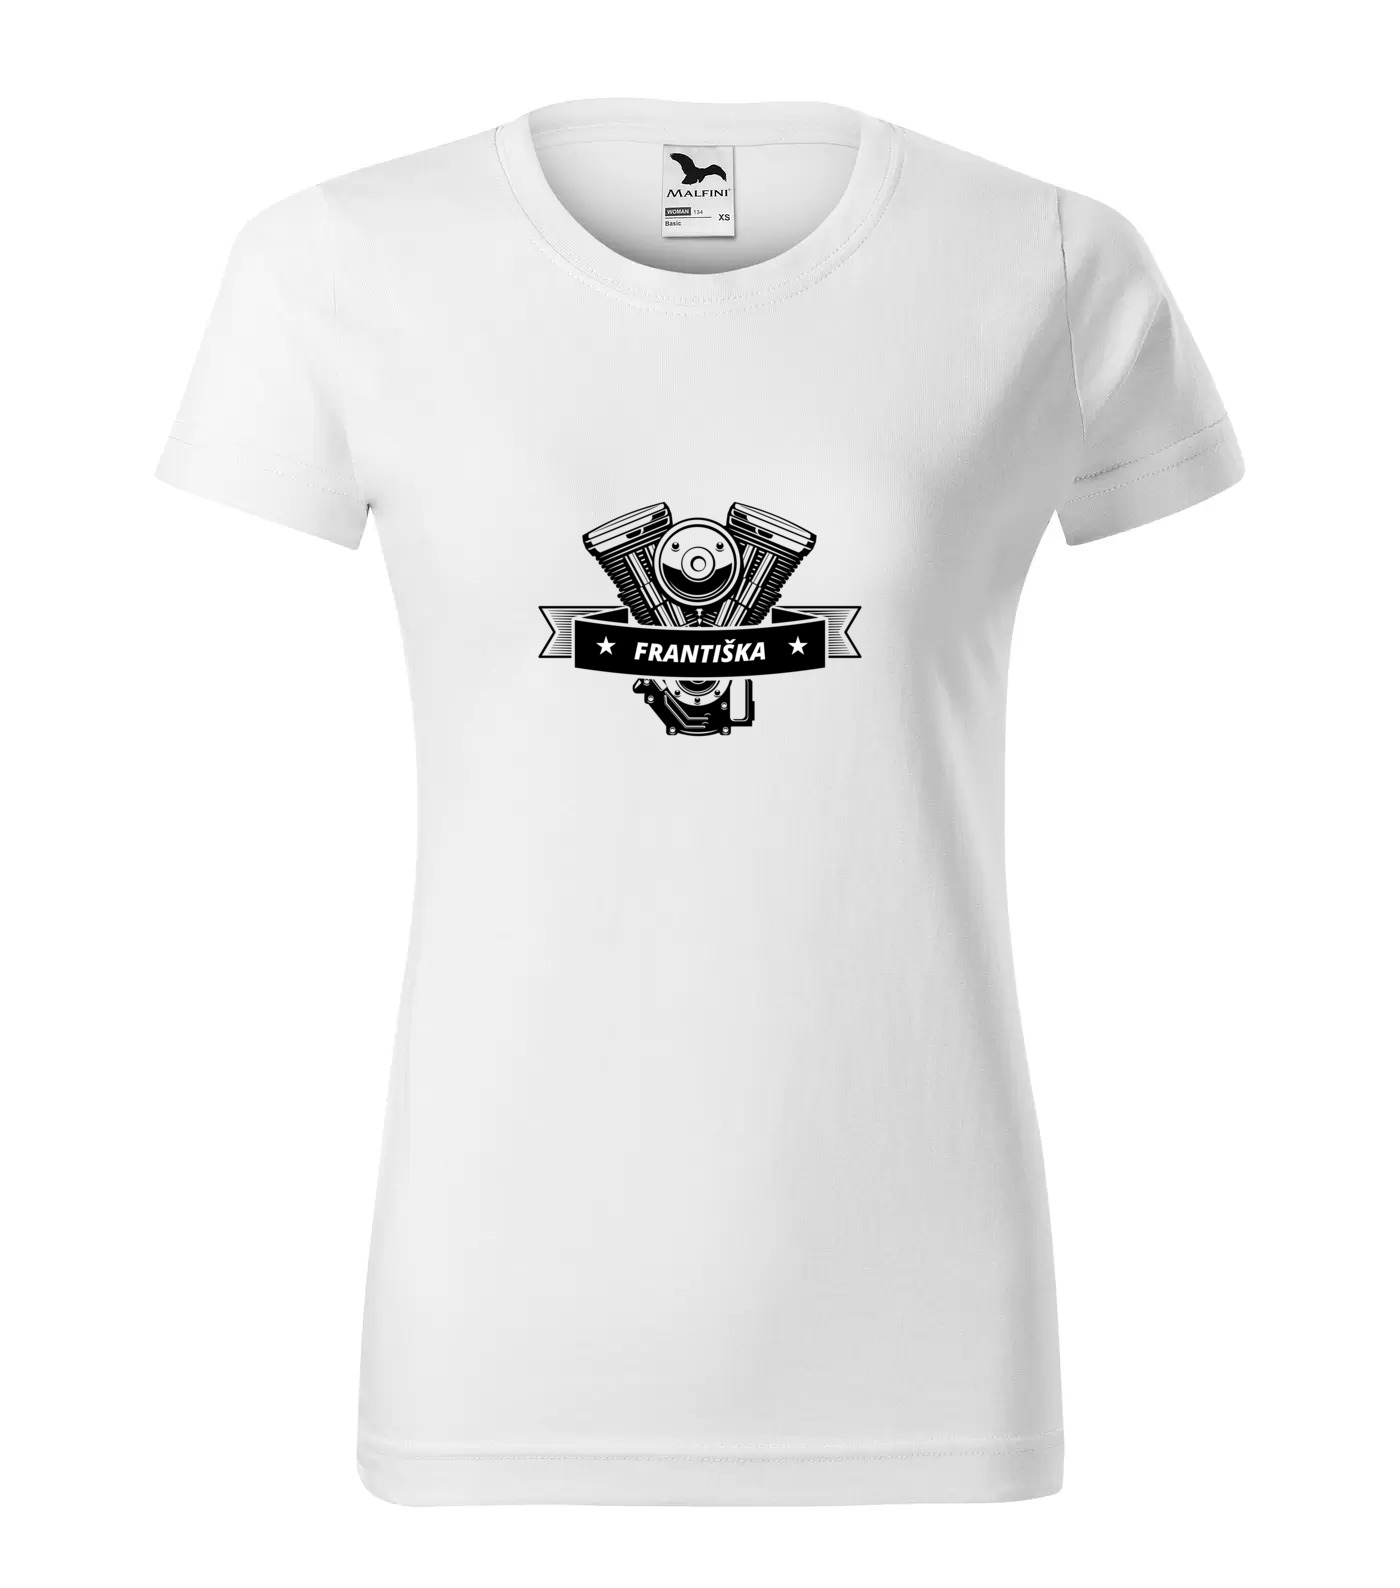 Tričko Motorkářka Františka